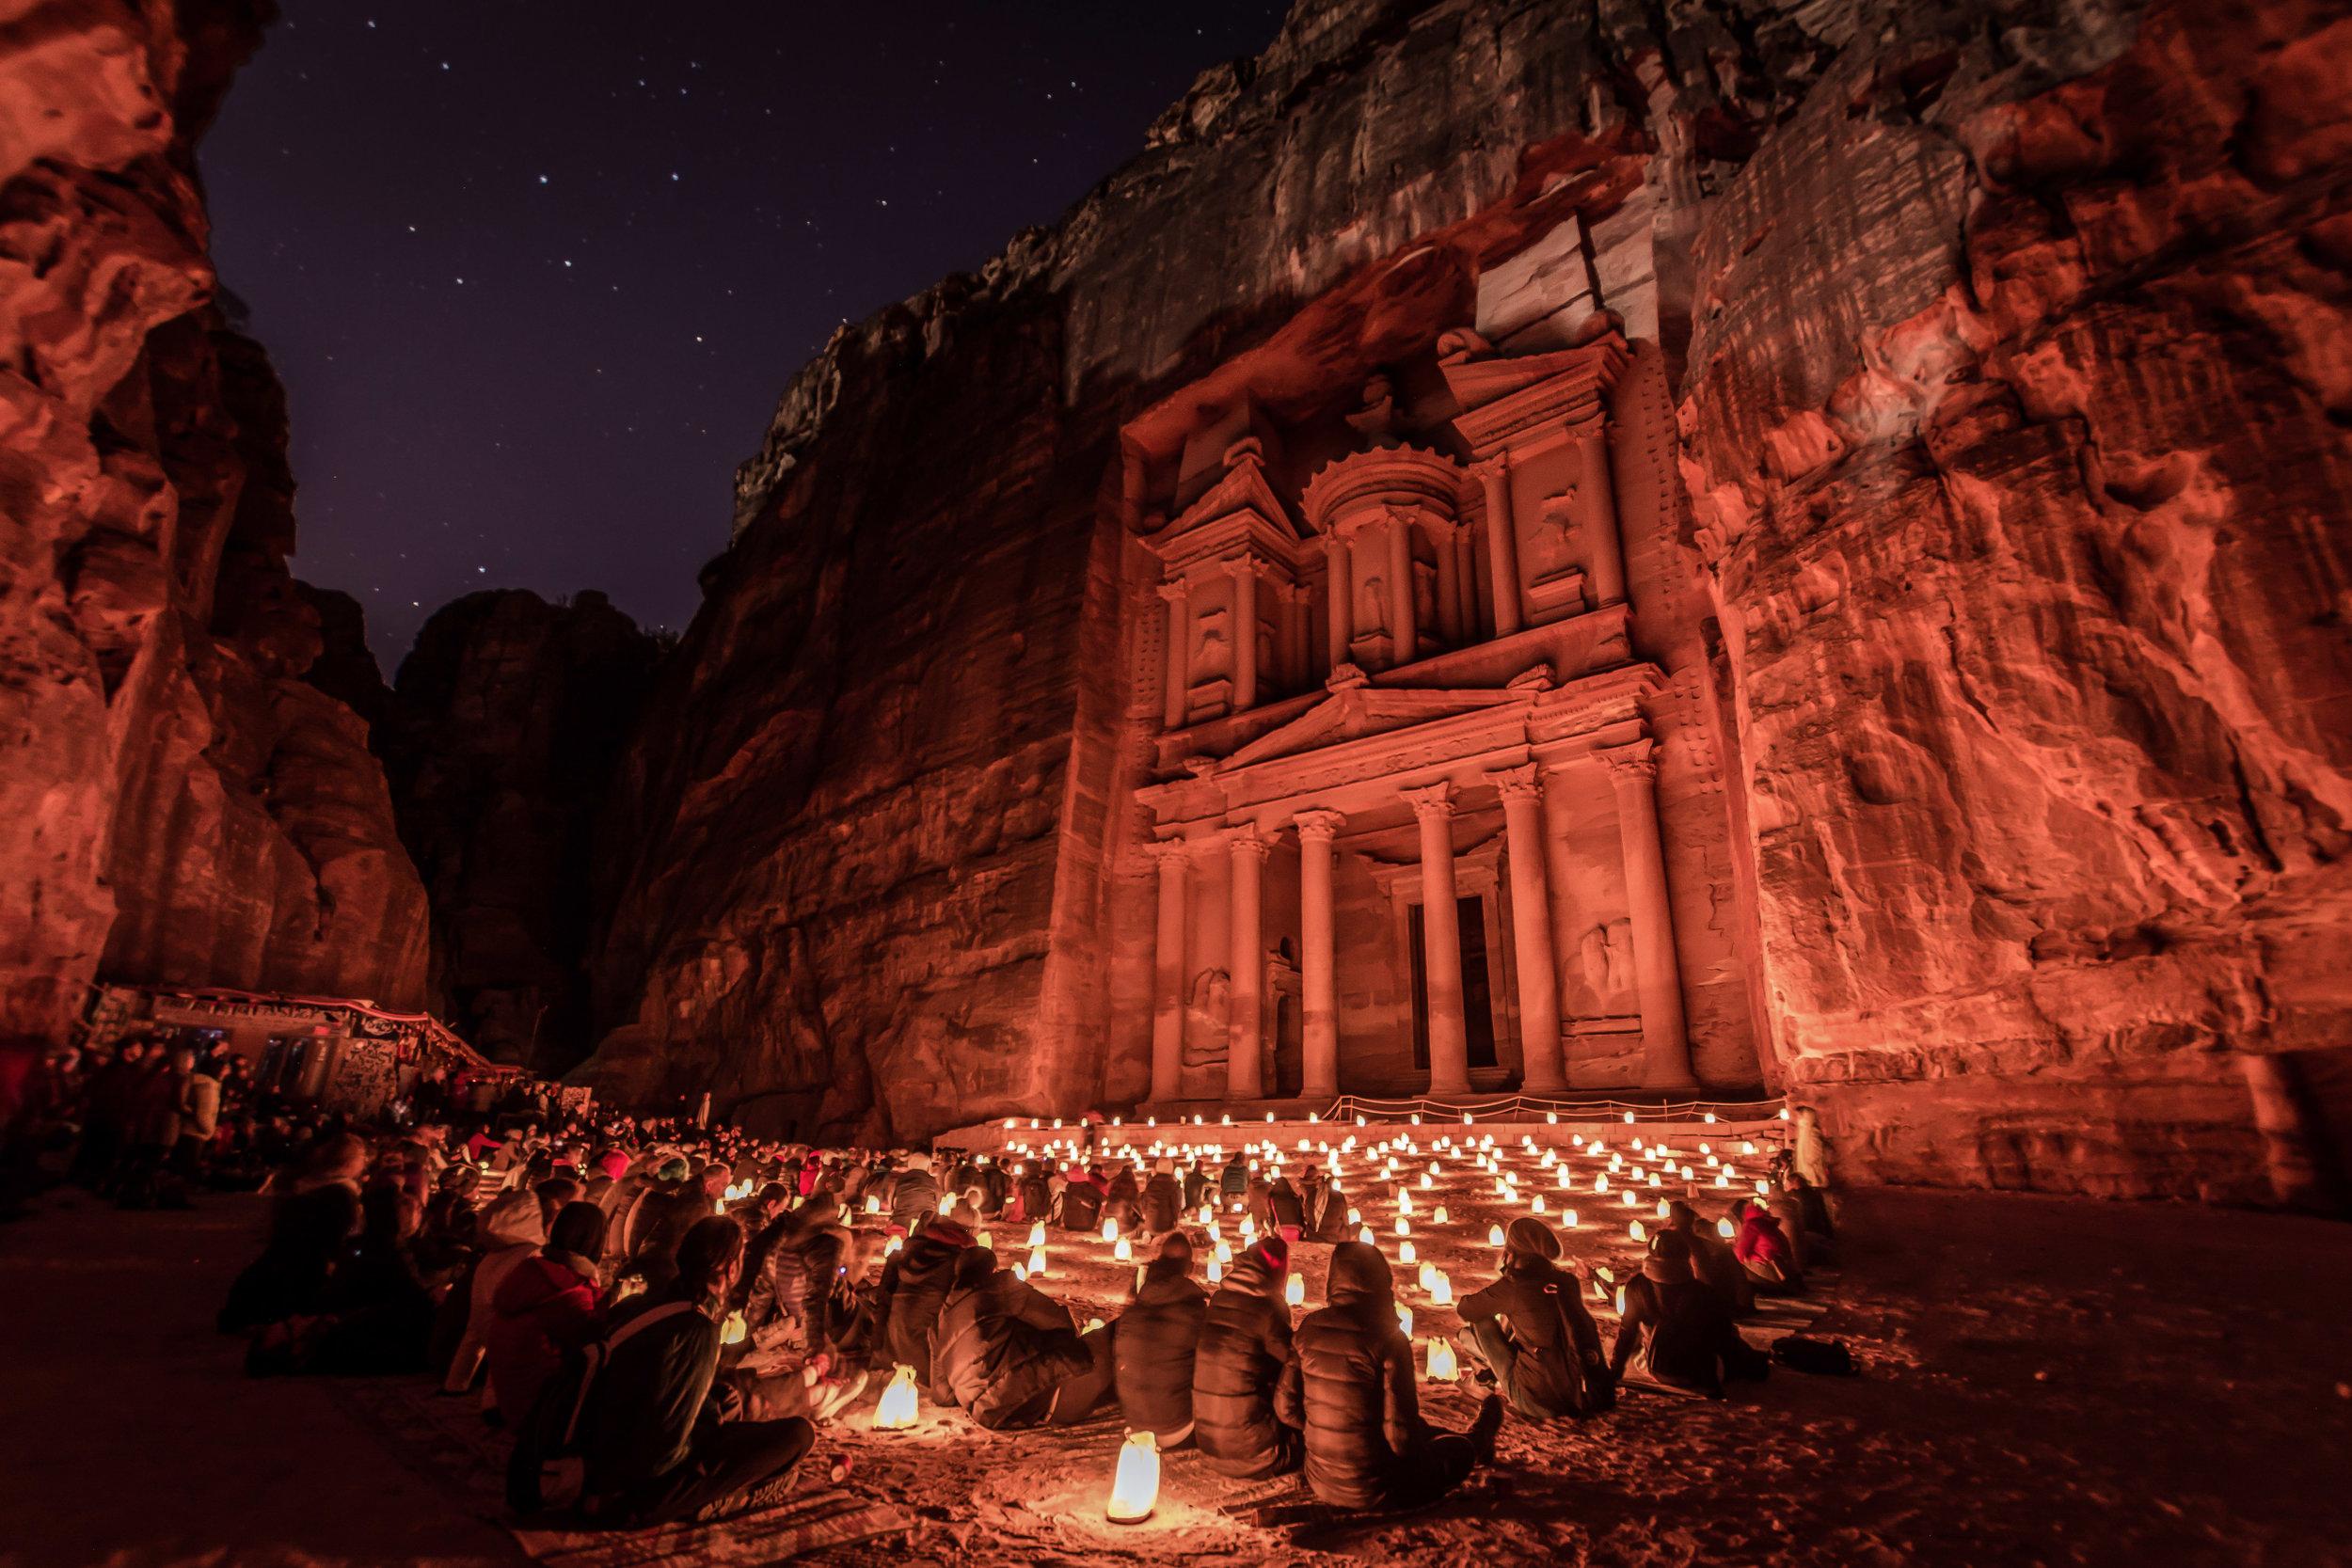 Petra's Treasury after dark. Photograph by Mustafa Waad Saeed, distributed under  CC BY-SA 4.0  license.